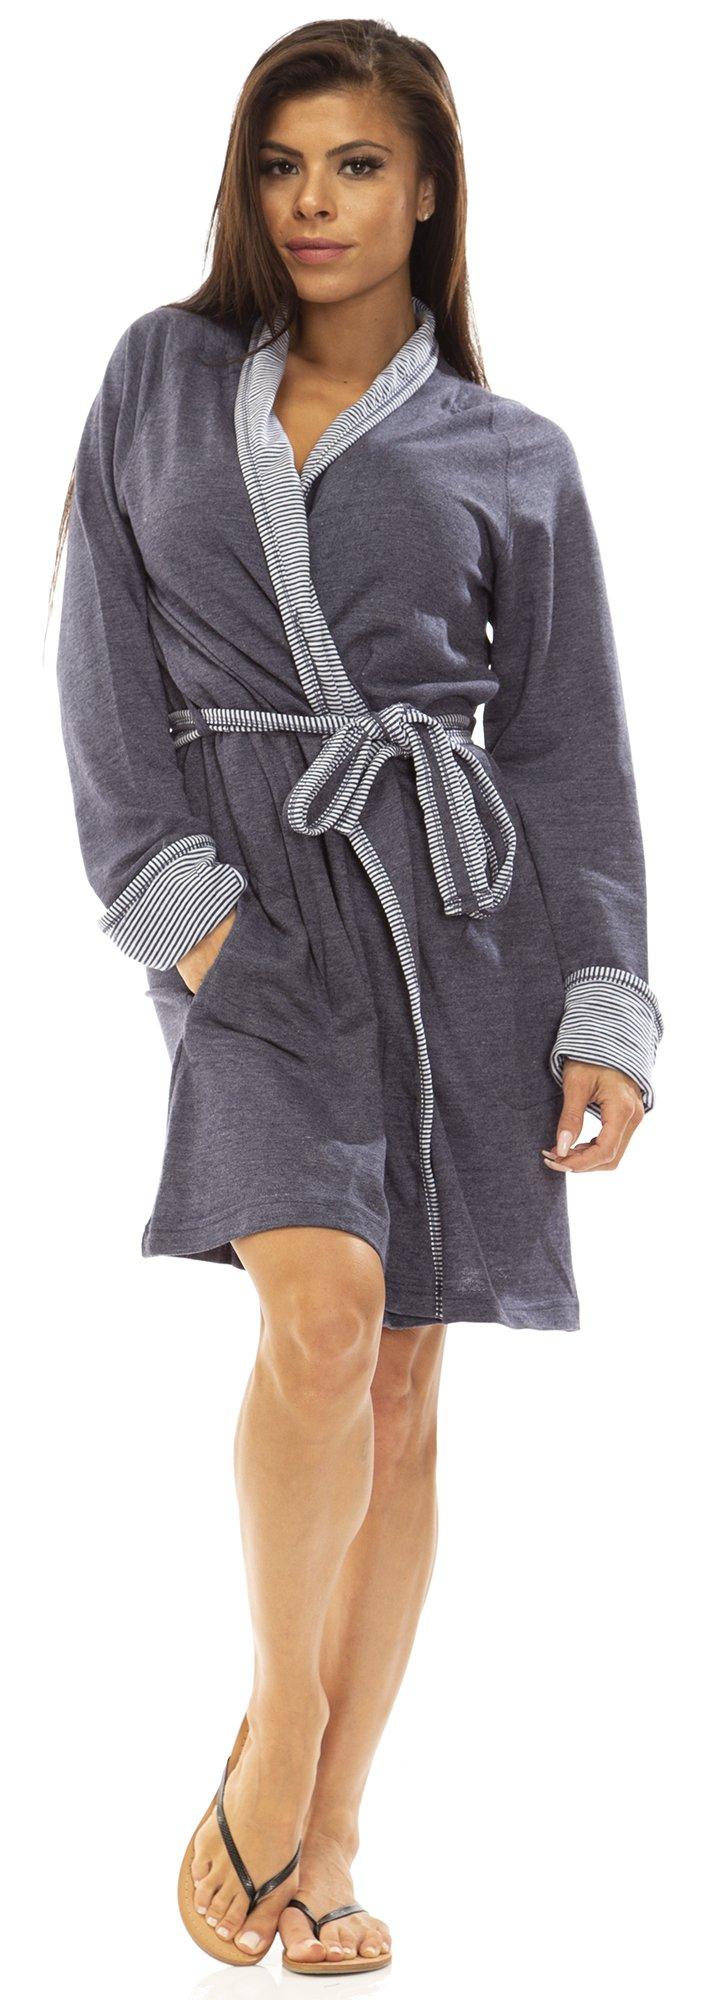 IZOD (5888AZ) Womens Lightweight 100% Cotton French Terry Robe Size: Small in Denim (422)